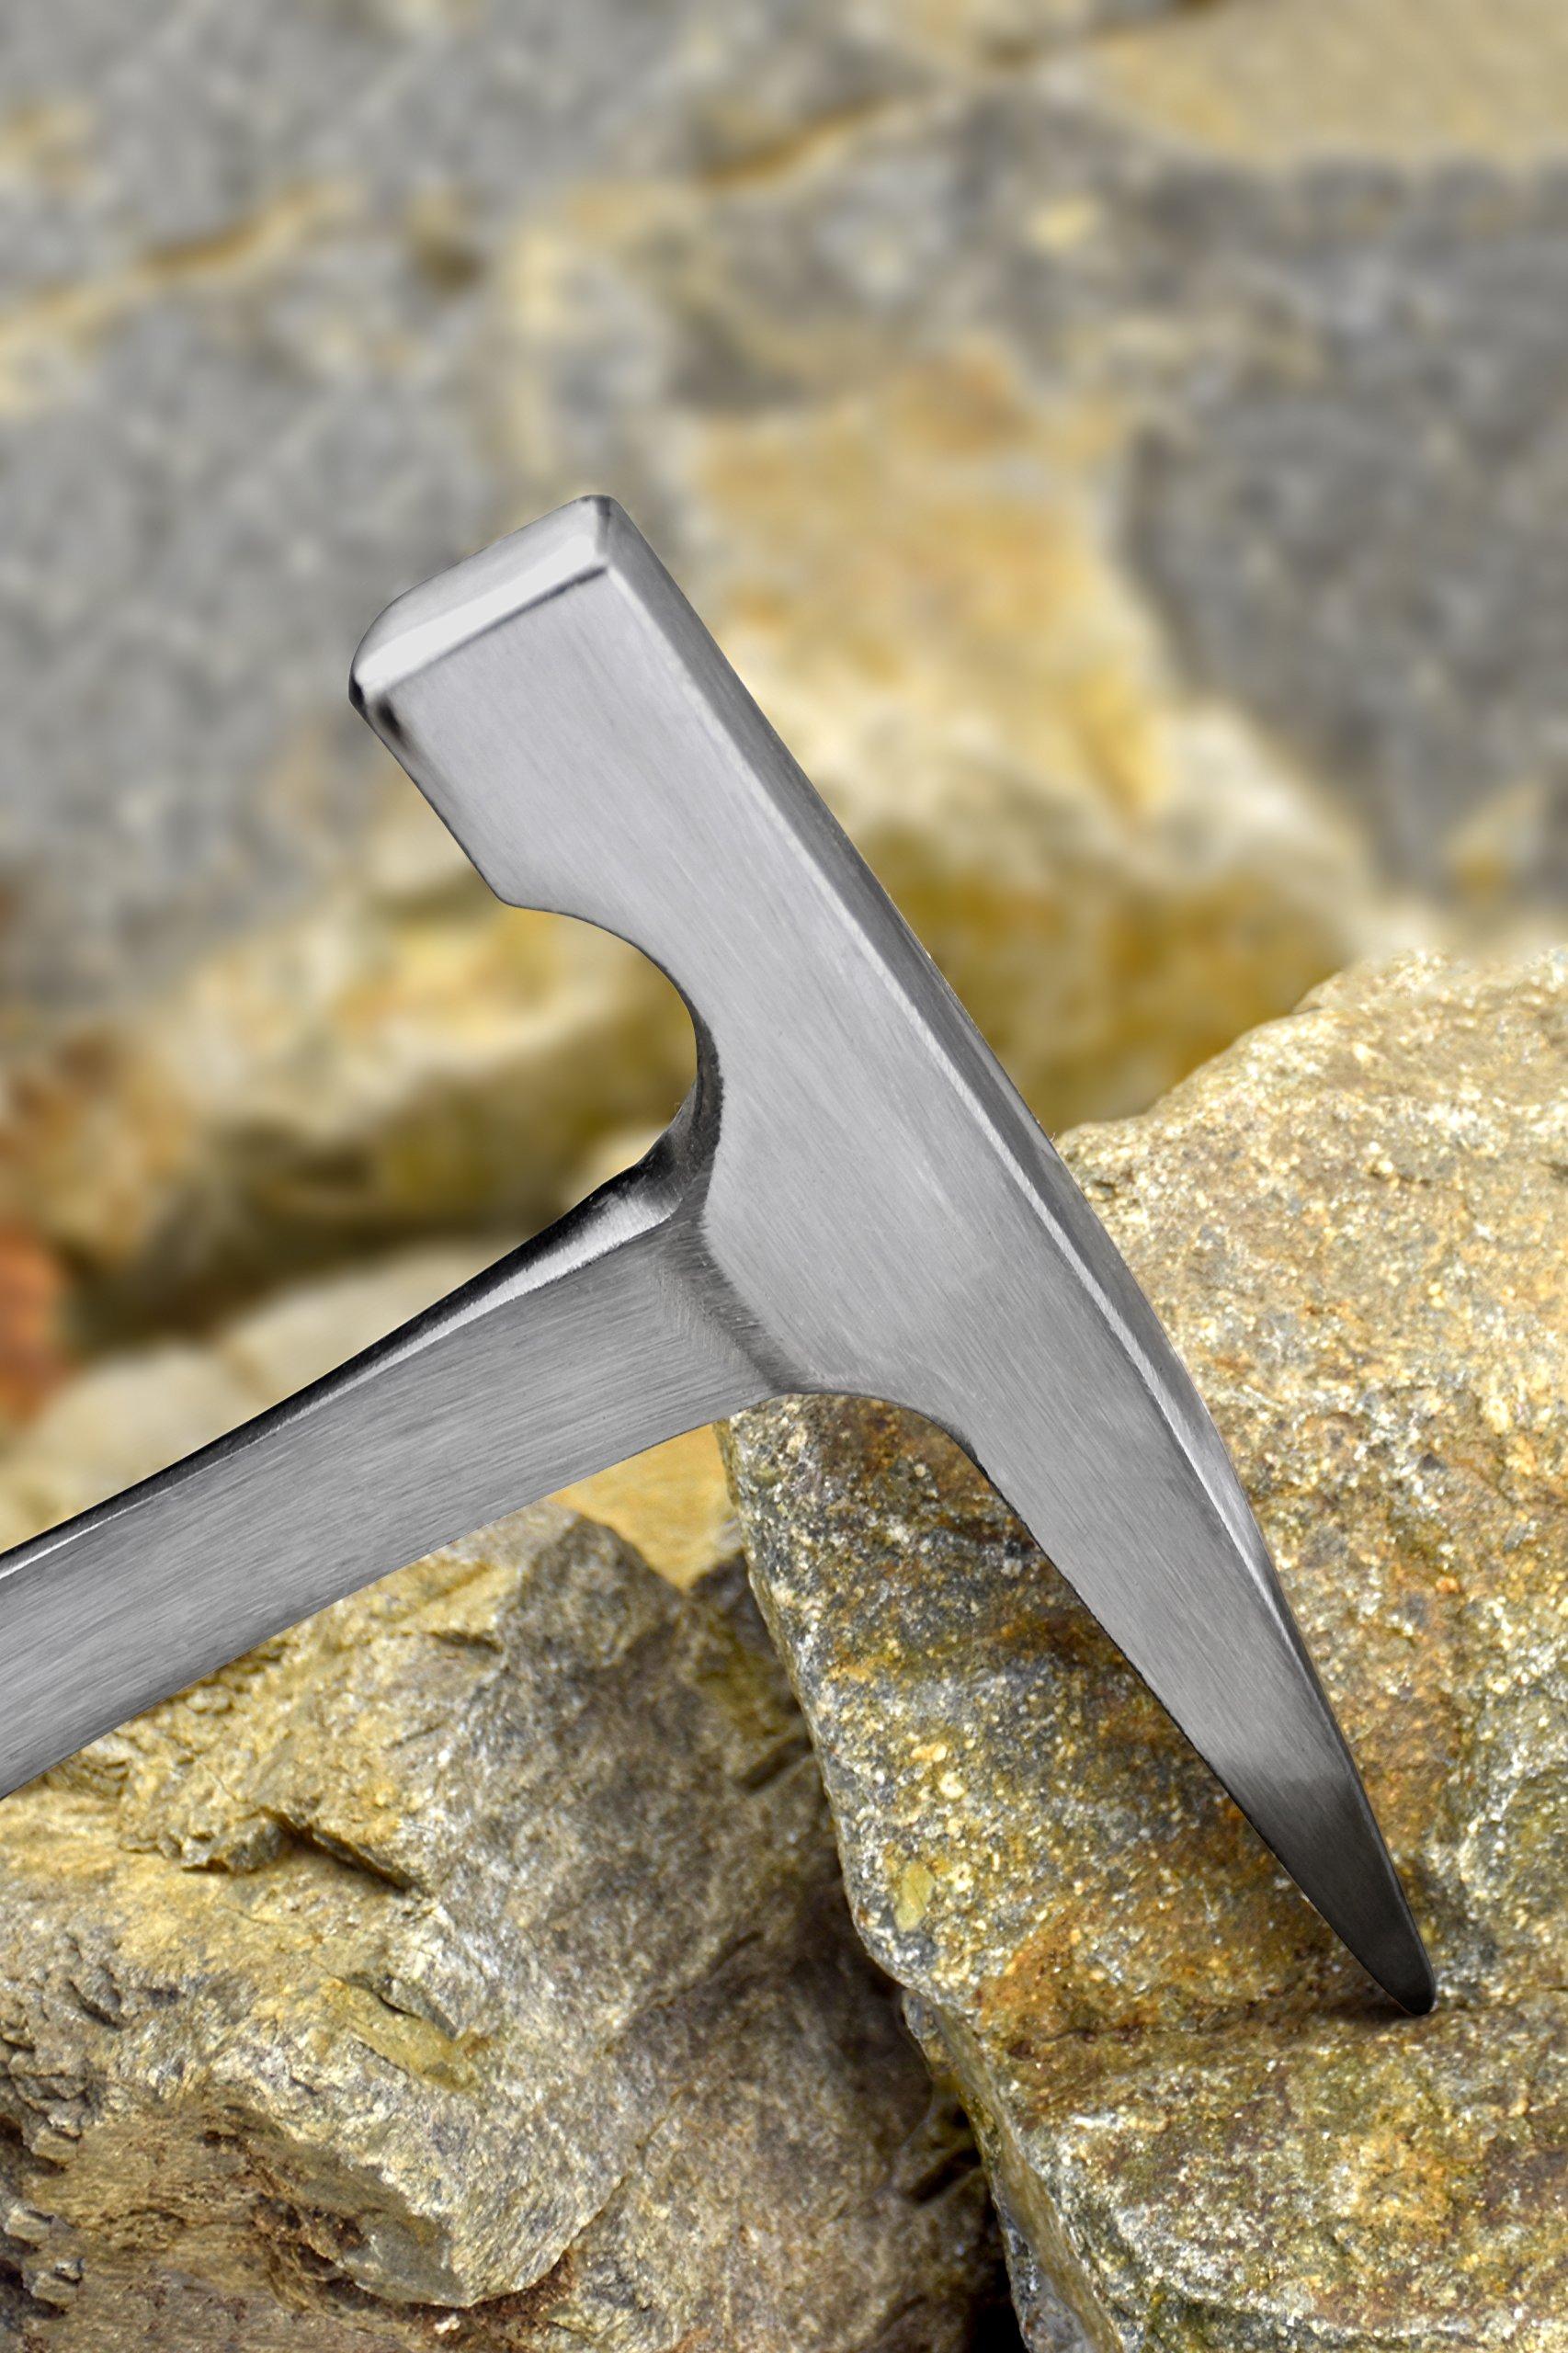 SE 8399-RH-ROCK 11-Inch Rock Hammer, 20 Oz. by SE (Image #3)